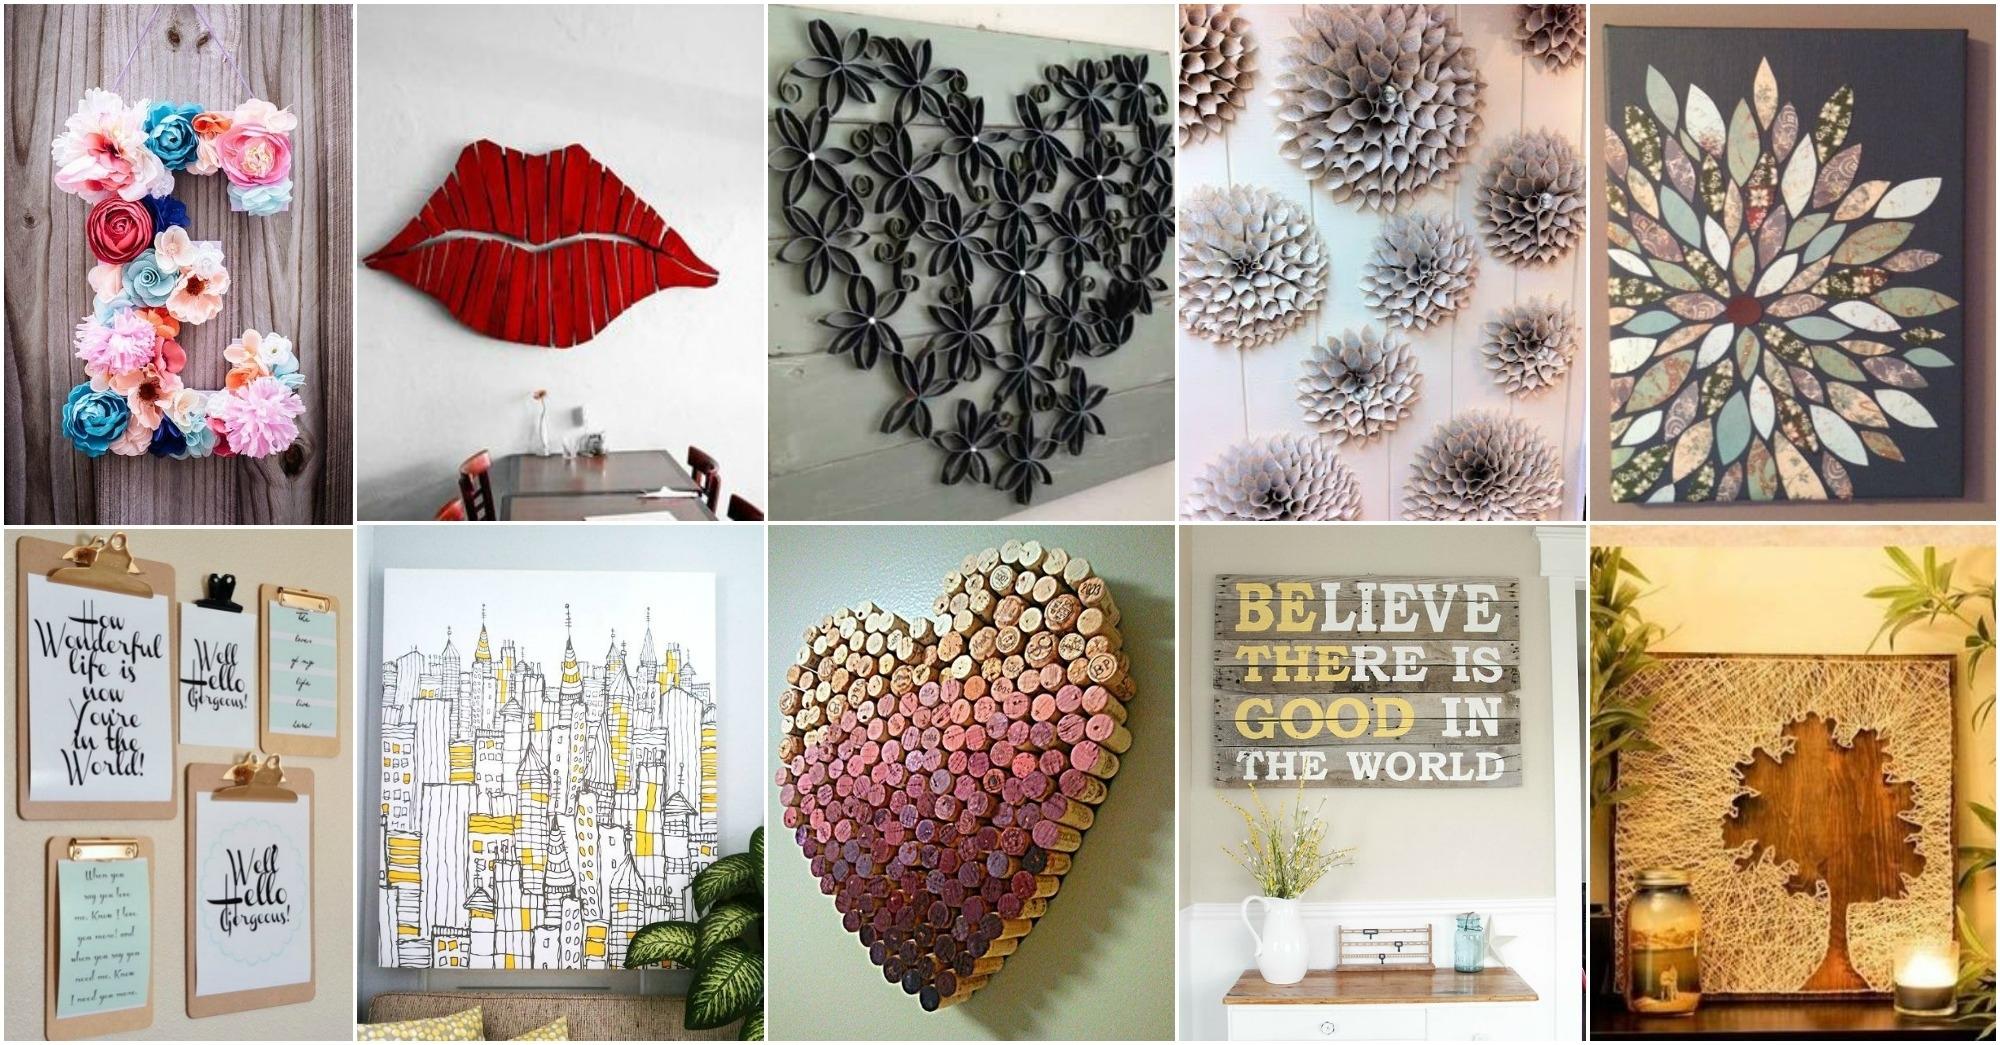 20 Diy Innovative Wall Art Decor Ideas That Will Leave You Speechless Regarding 2018 Art Wall Decor (View 13 of 20)